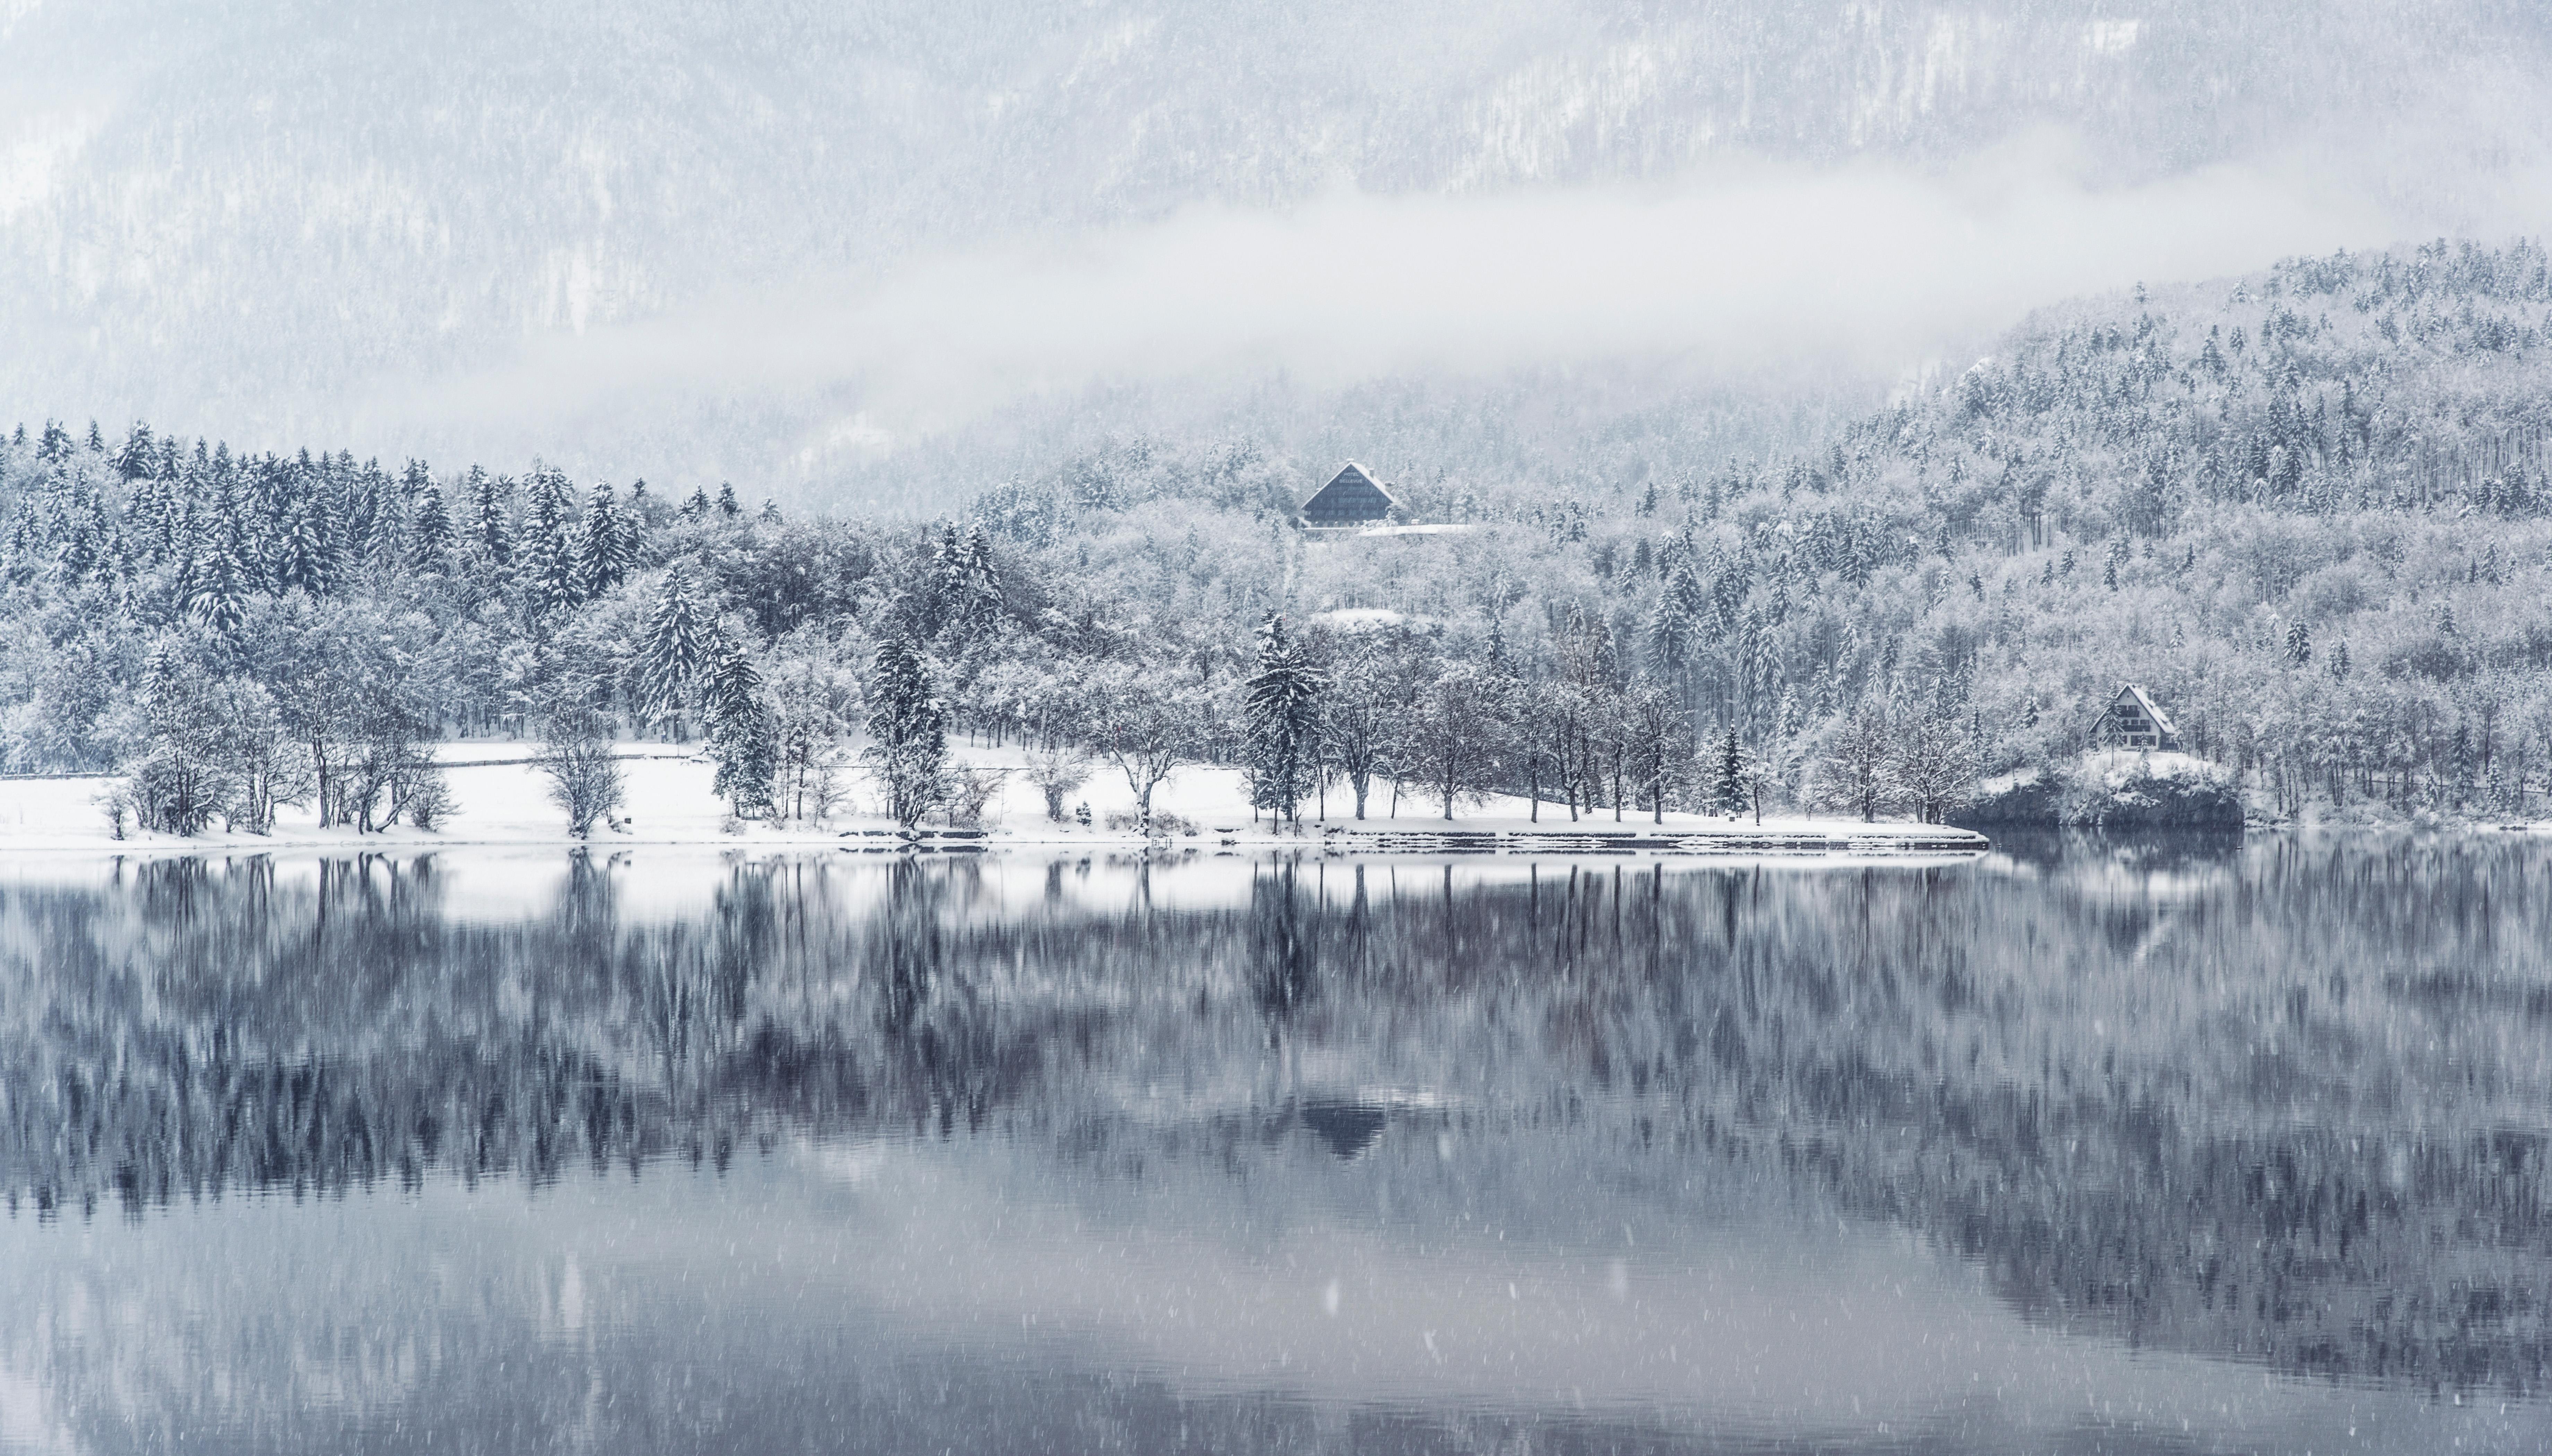 Winter Landscape Stock Photos, Images, & Pictures ...